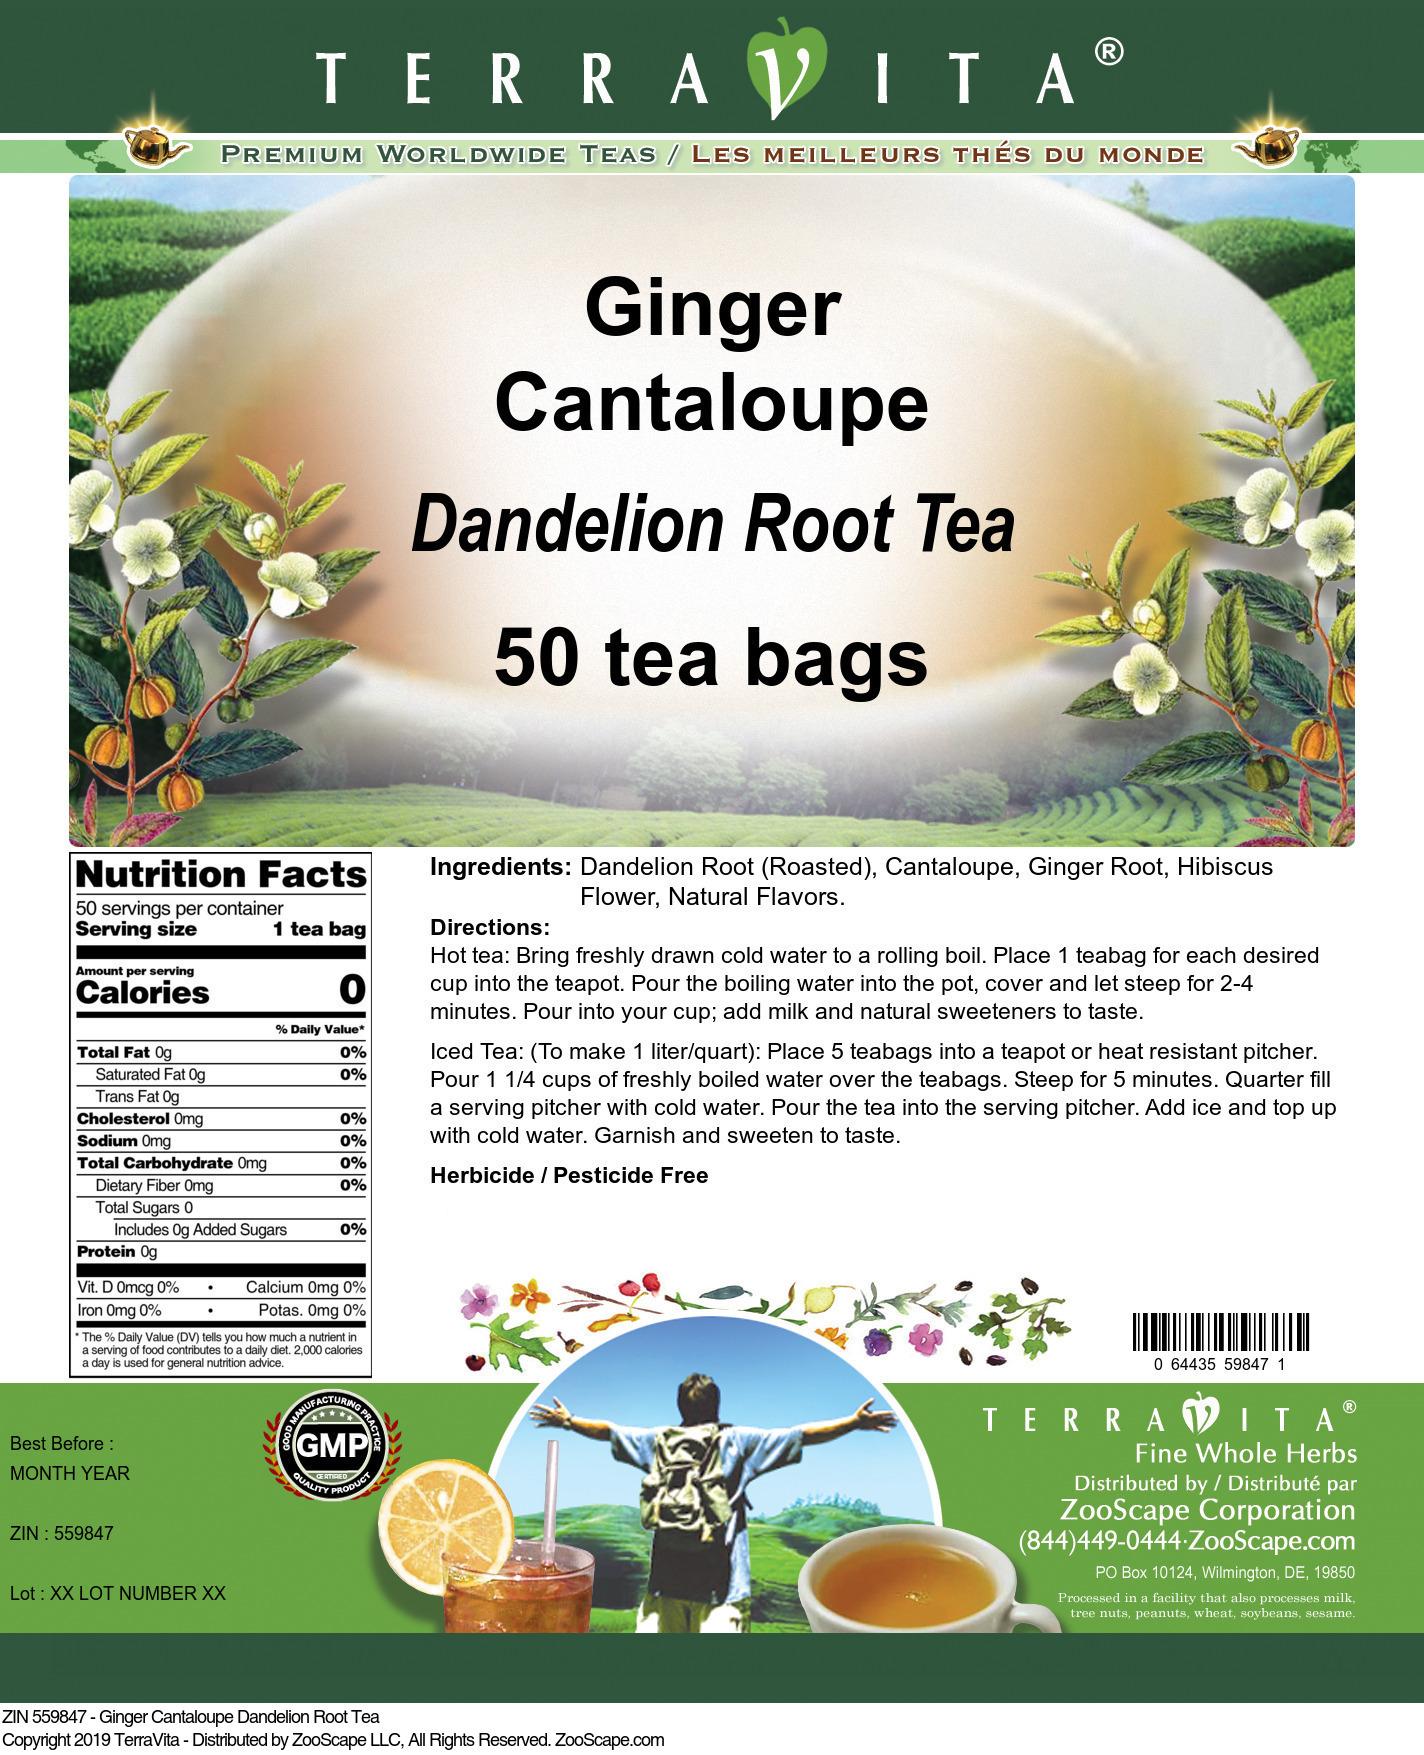 Ginger Cantaloupe Dandelion Root